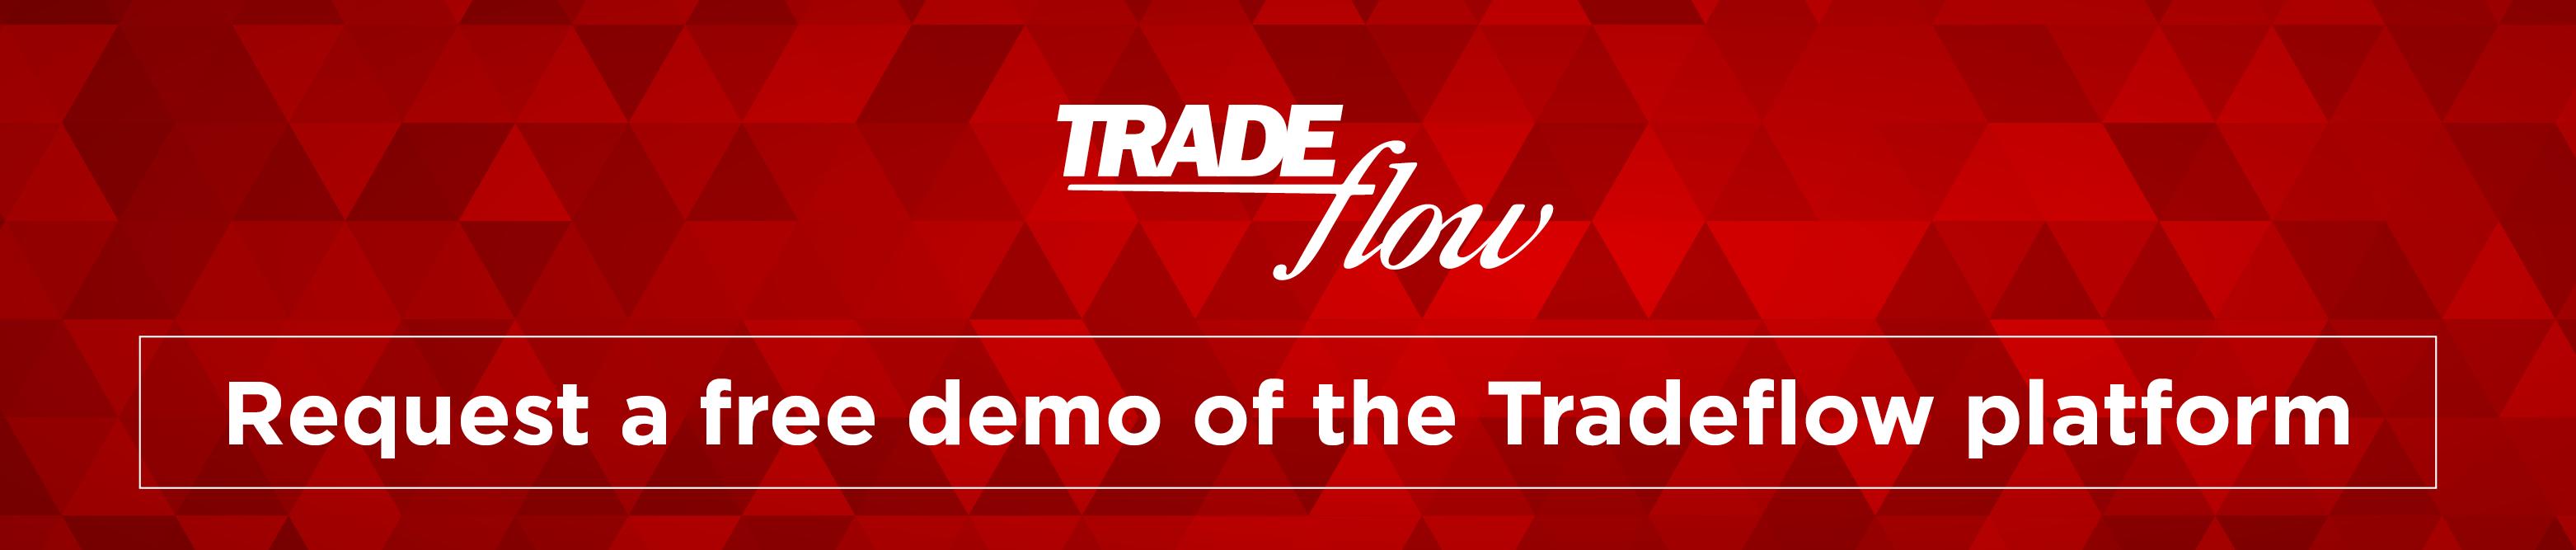 TradeFlow demo